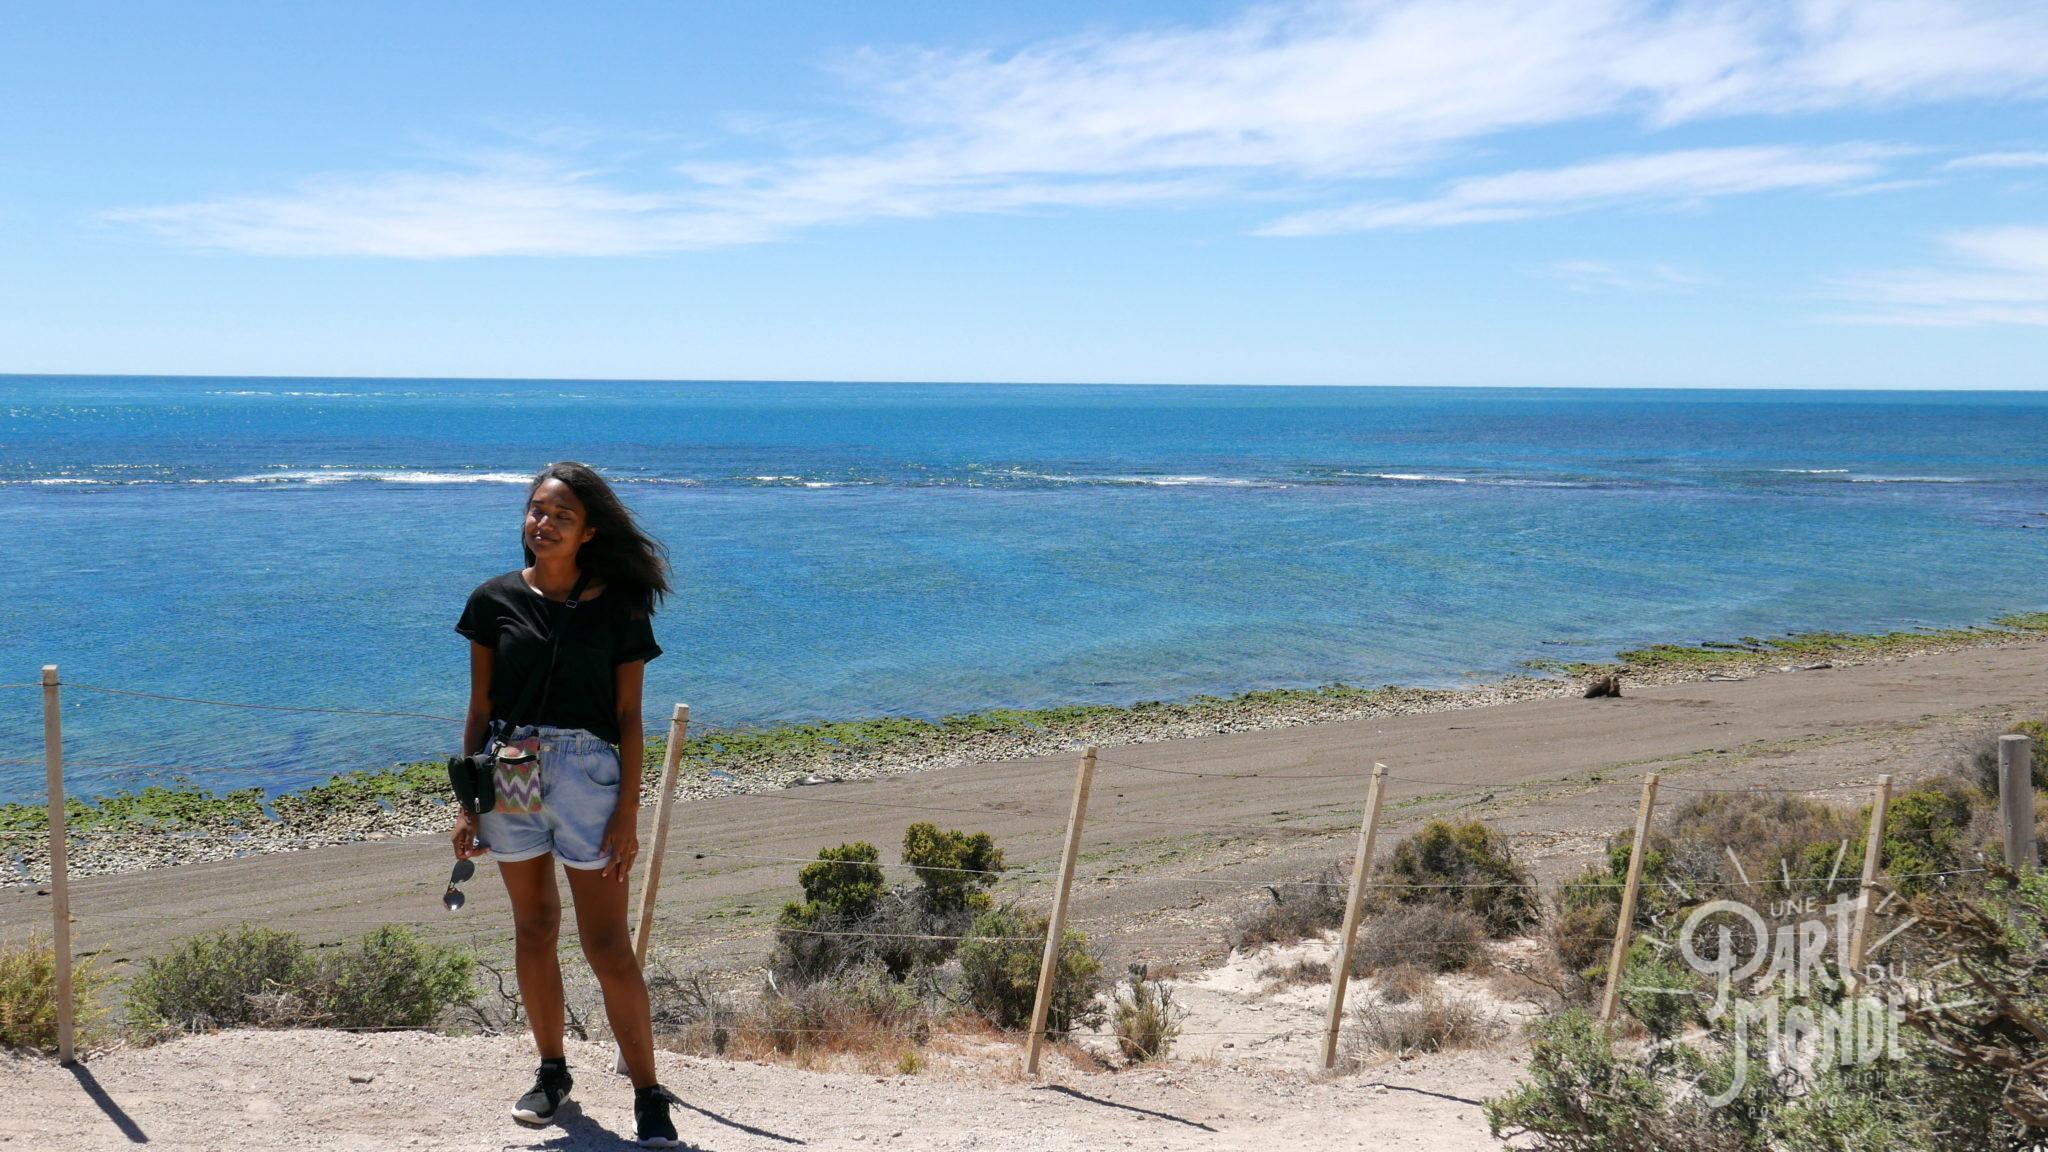 péninsule de valdès krystel paysage